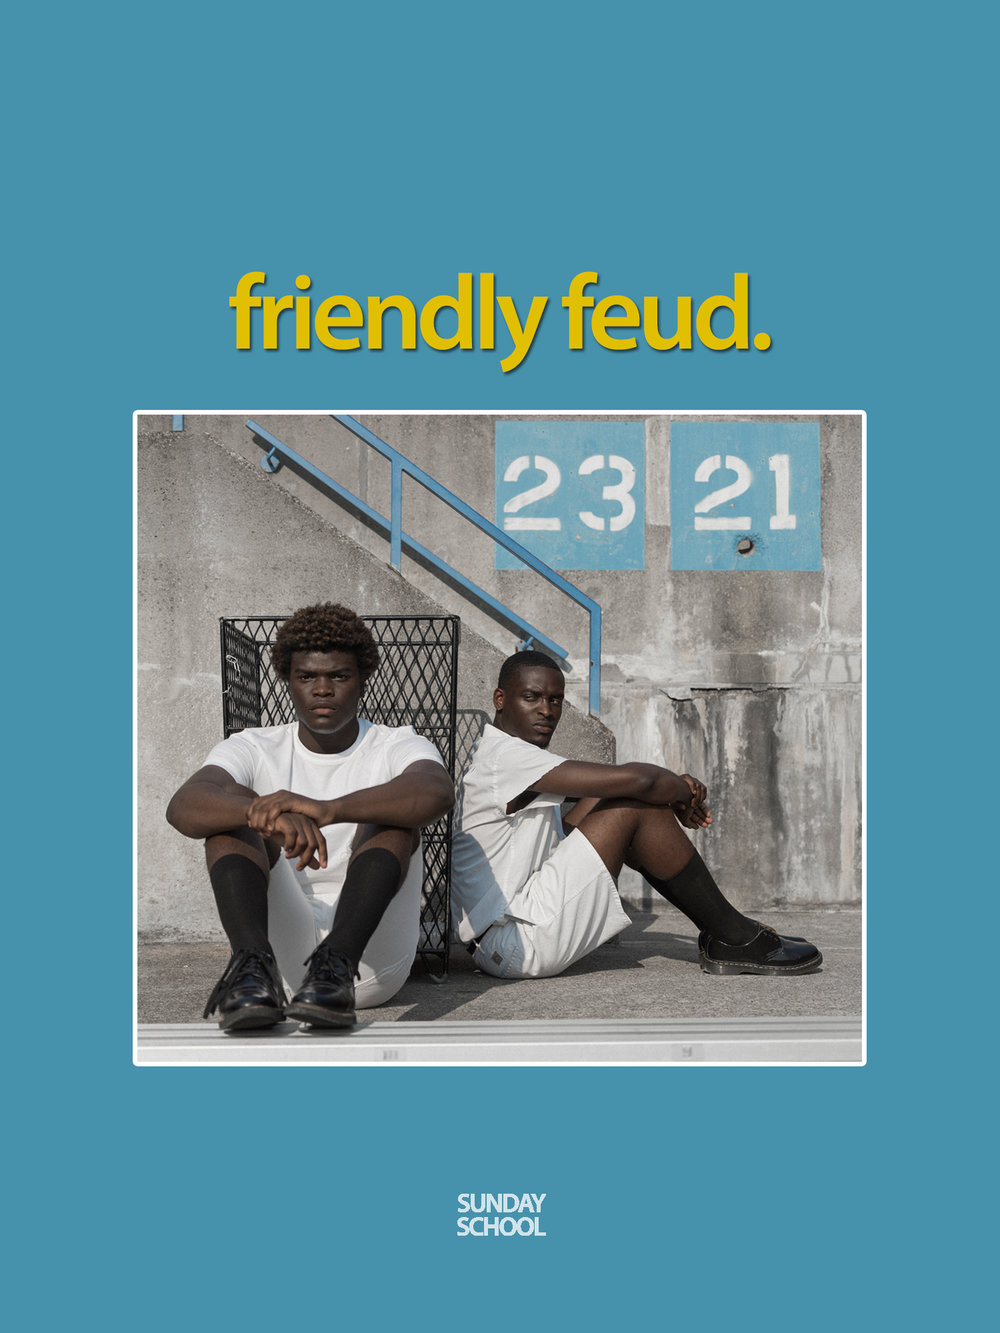 friendly2.jpg